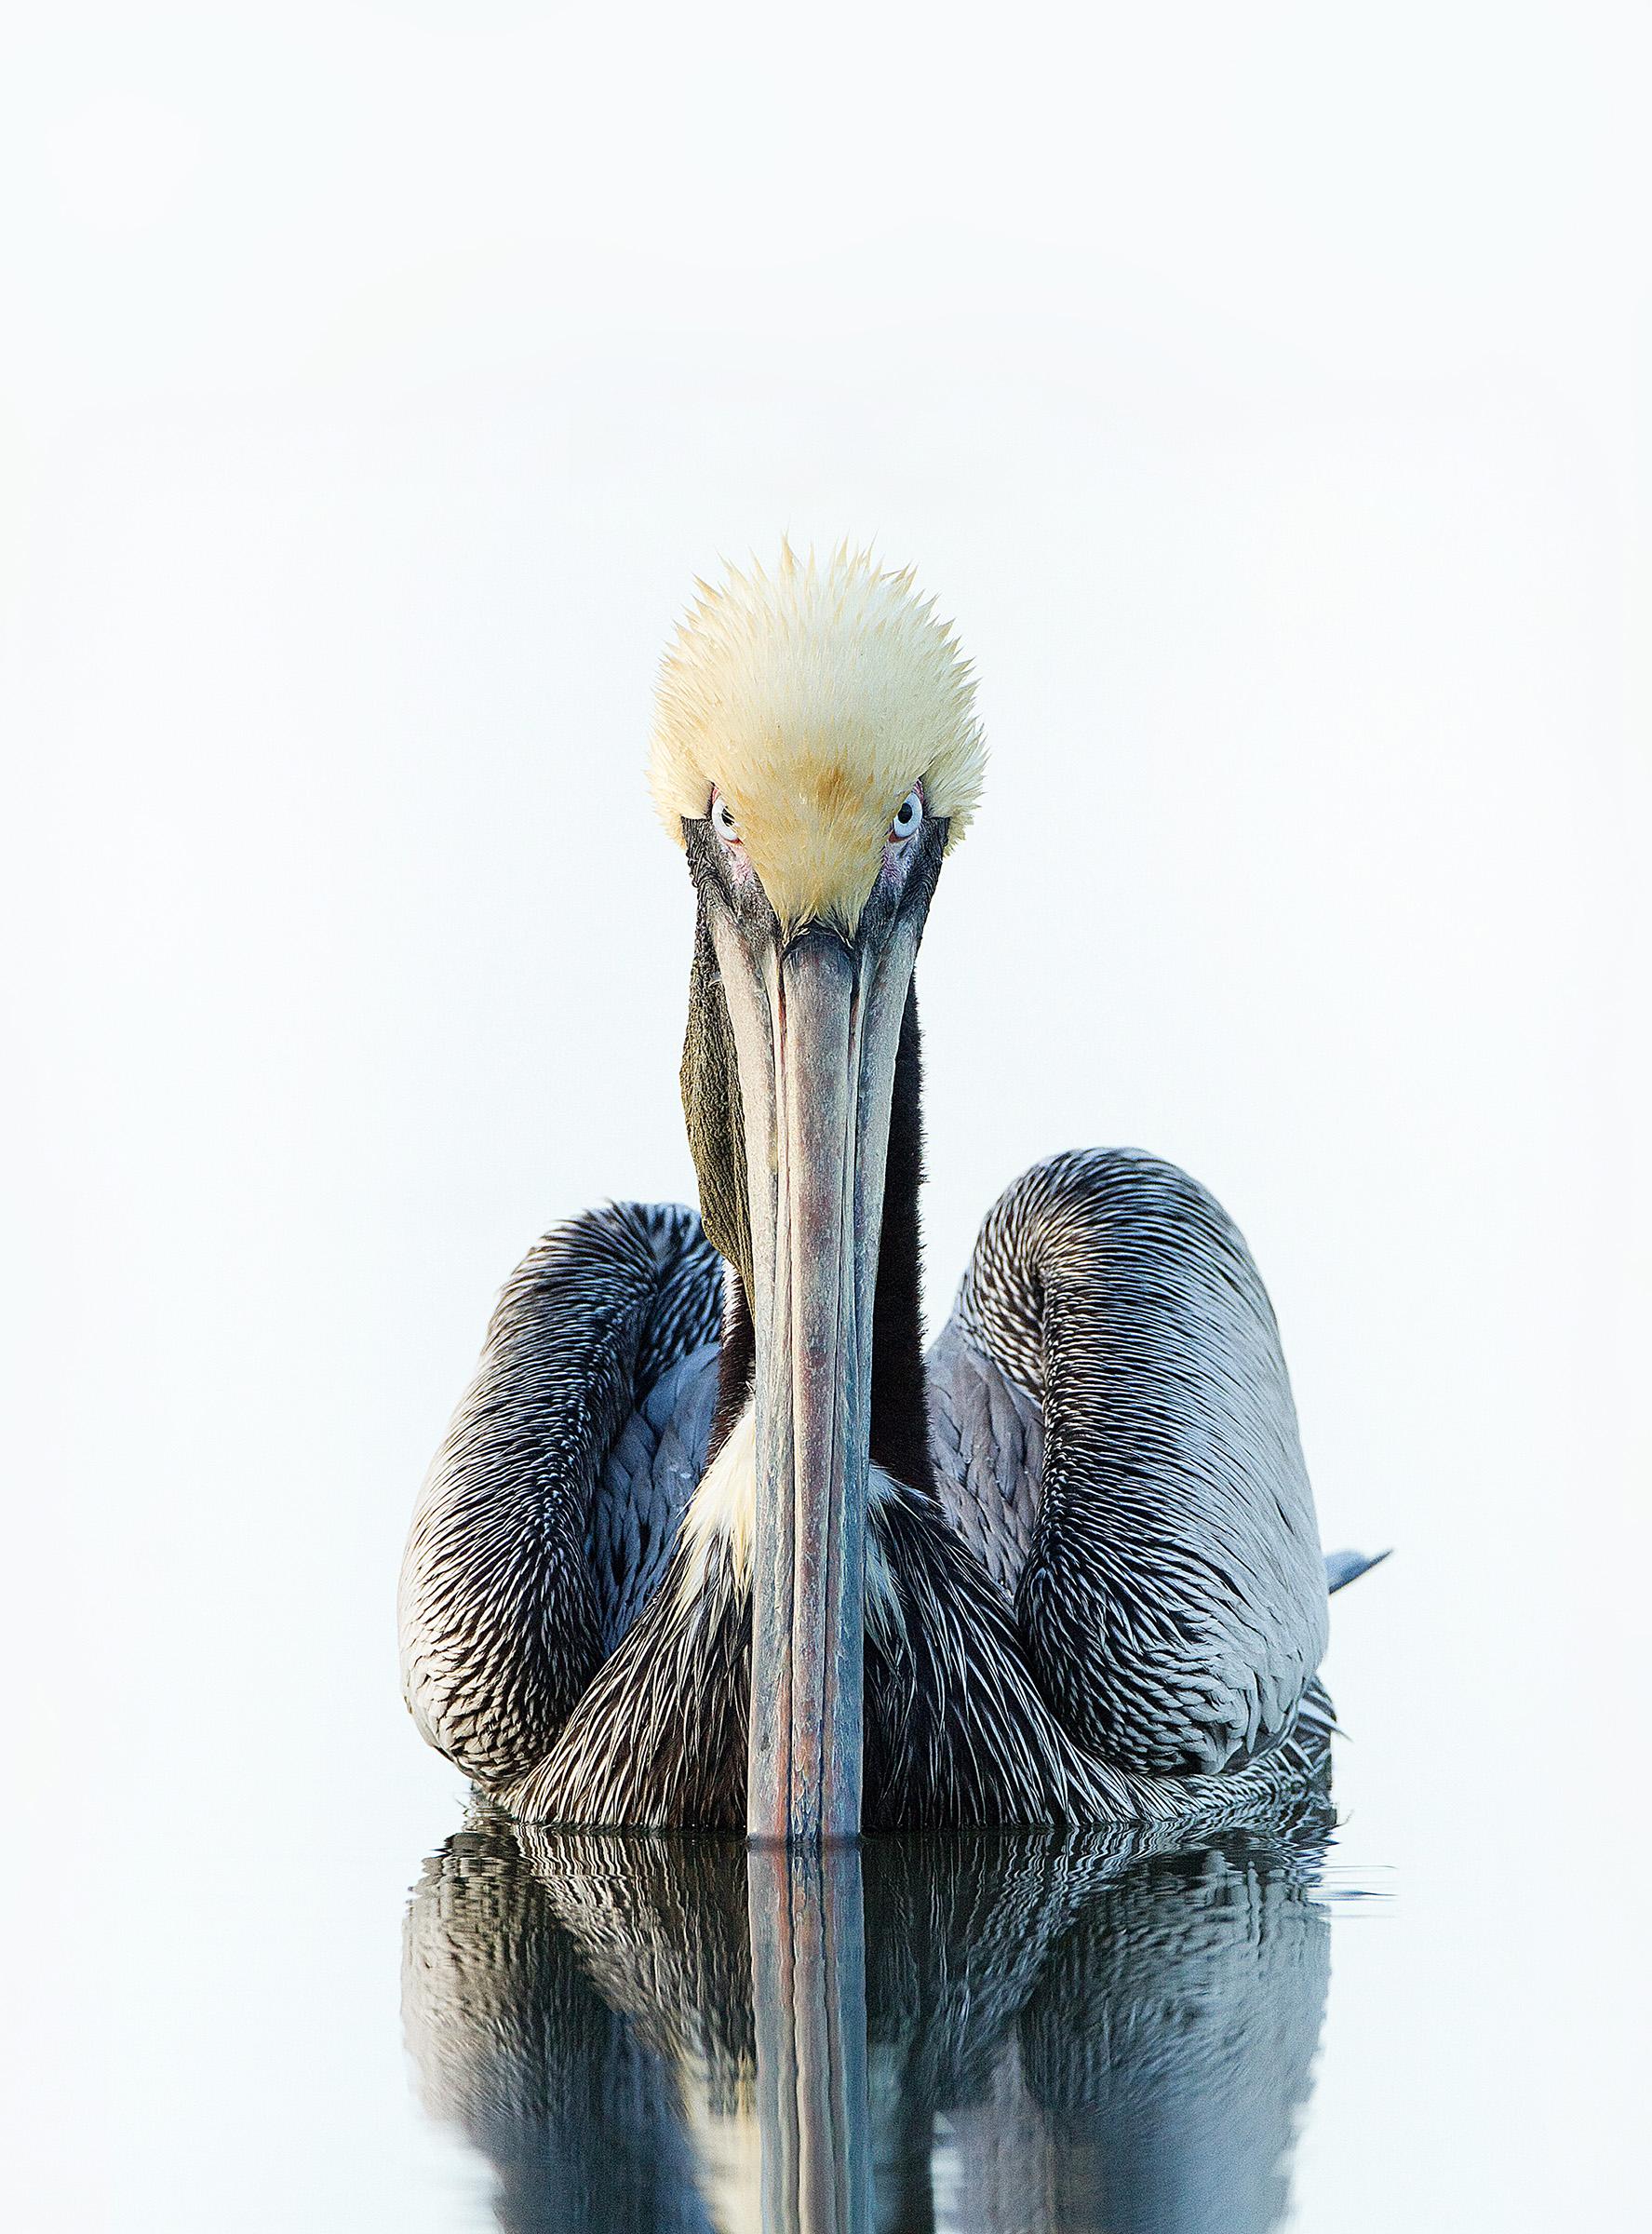 Brown Pelican. Roger Williams/Audubon Photography Awards